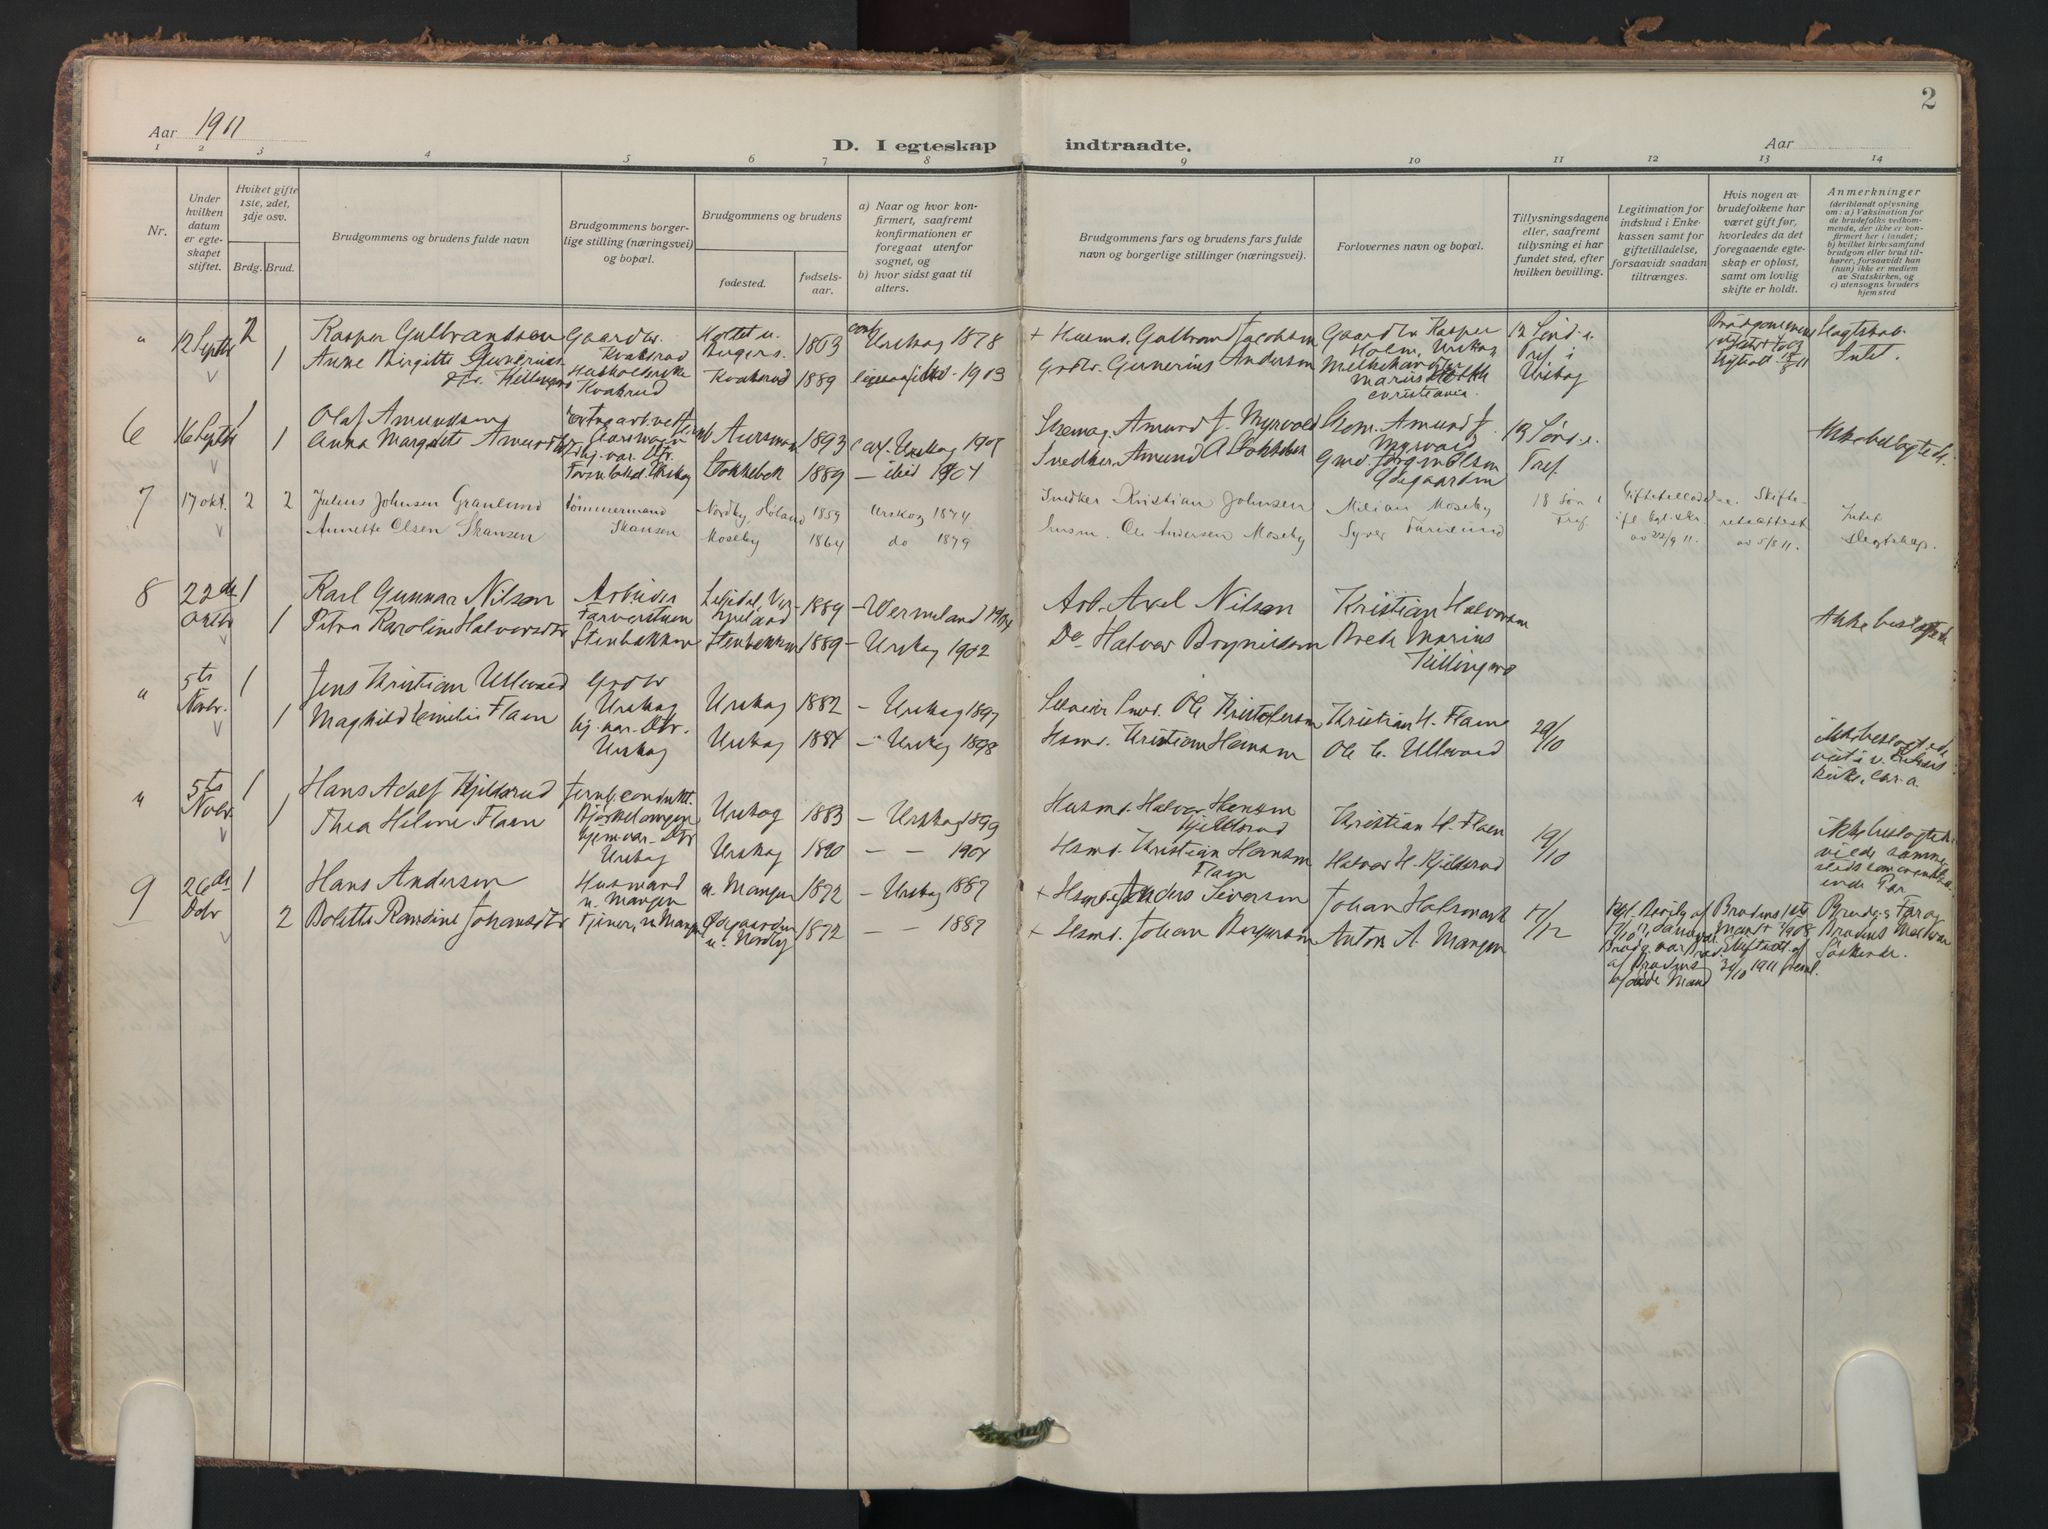 SAO, Aurskog prestekontor Kirkebøker, F/Fa/L0016: Parish register (official) no. I 16, 1910-1934, p. 2